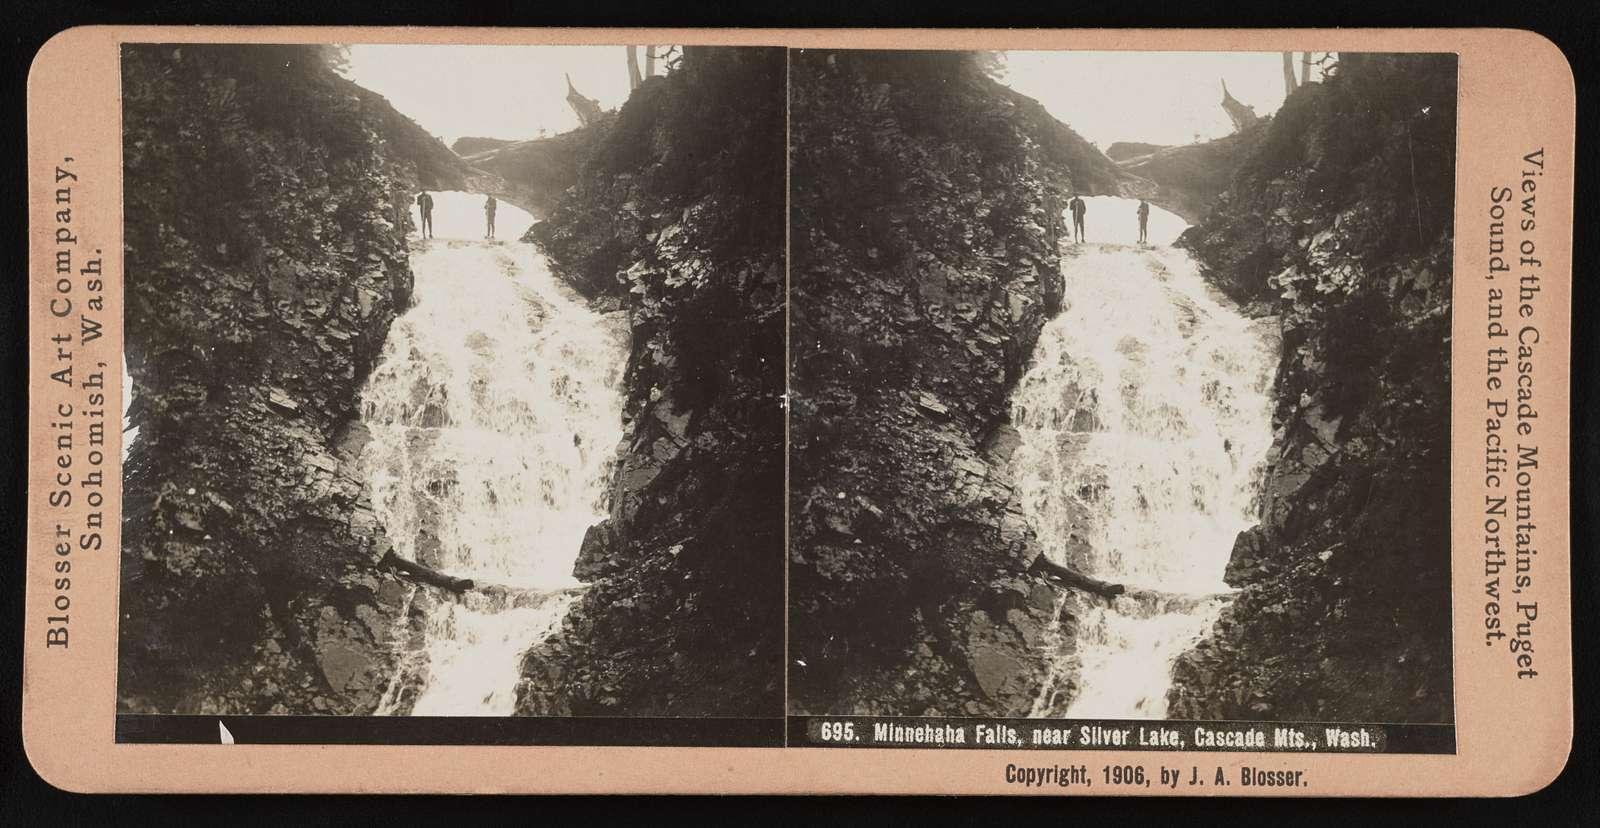 Minnehaha Falls, near Silver Lake, Cascade Mts., Wash